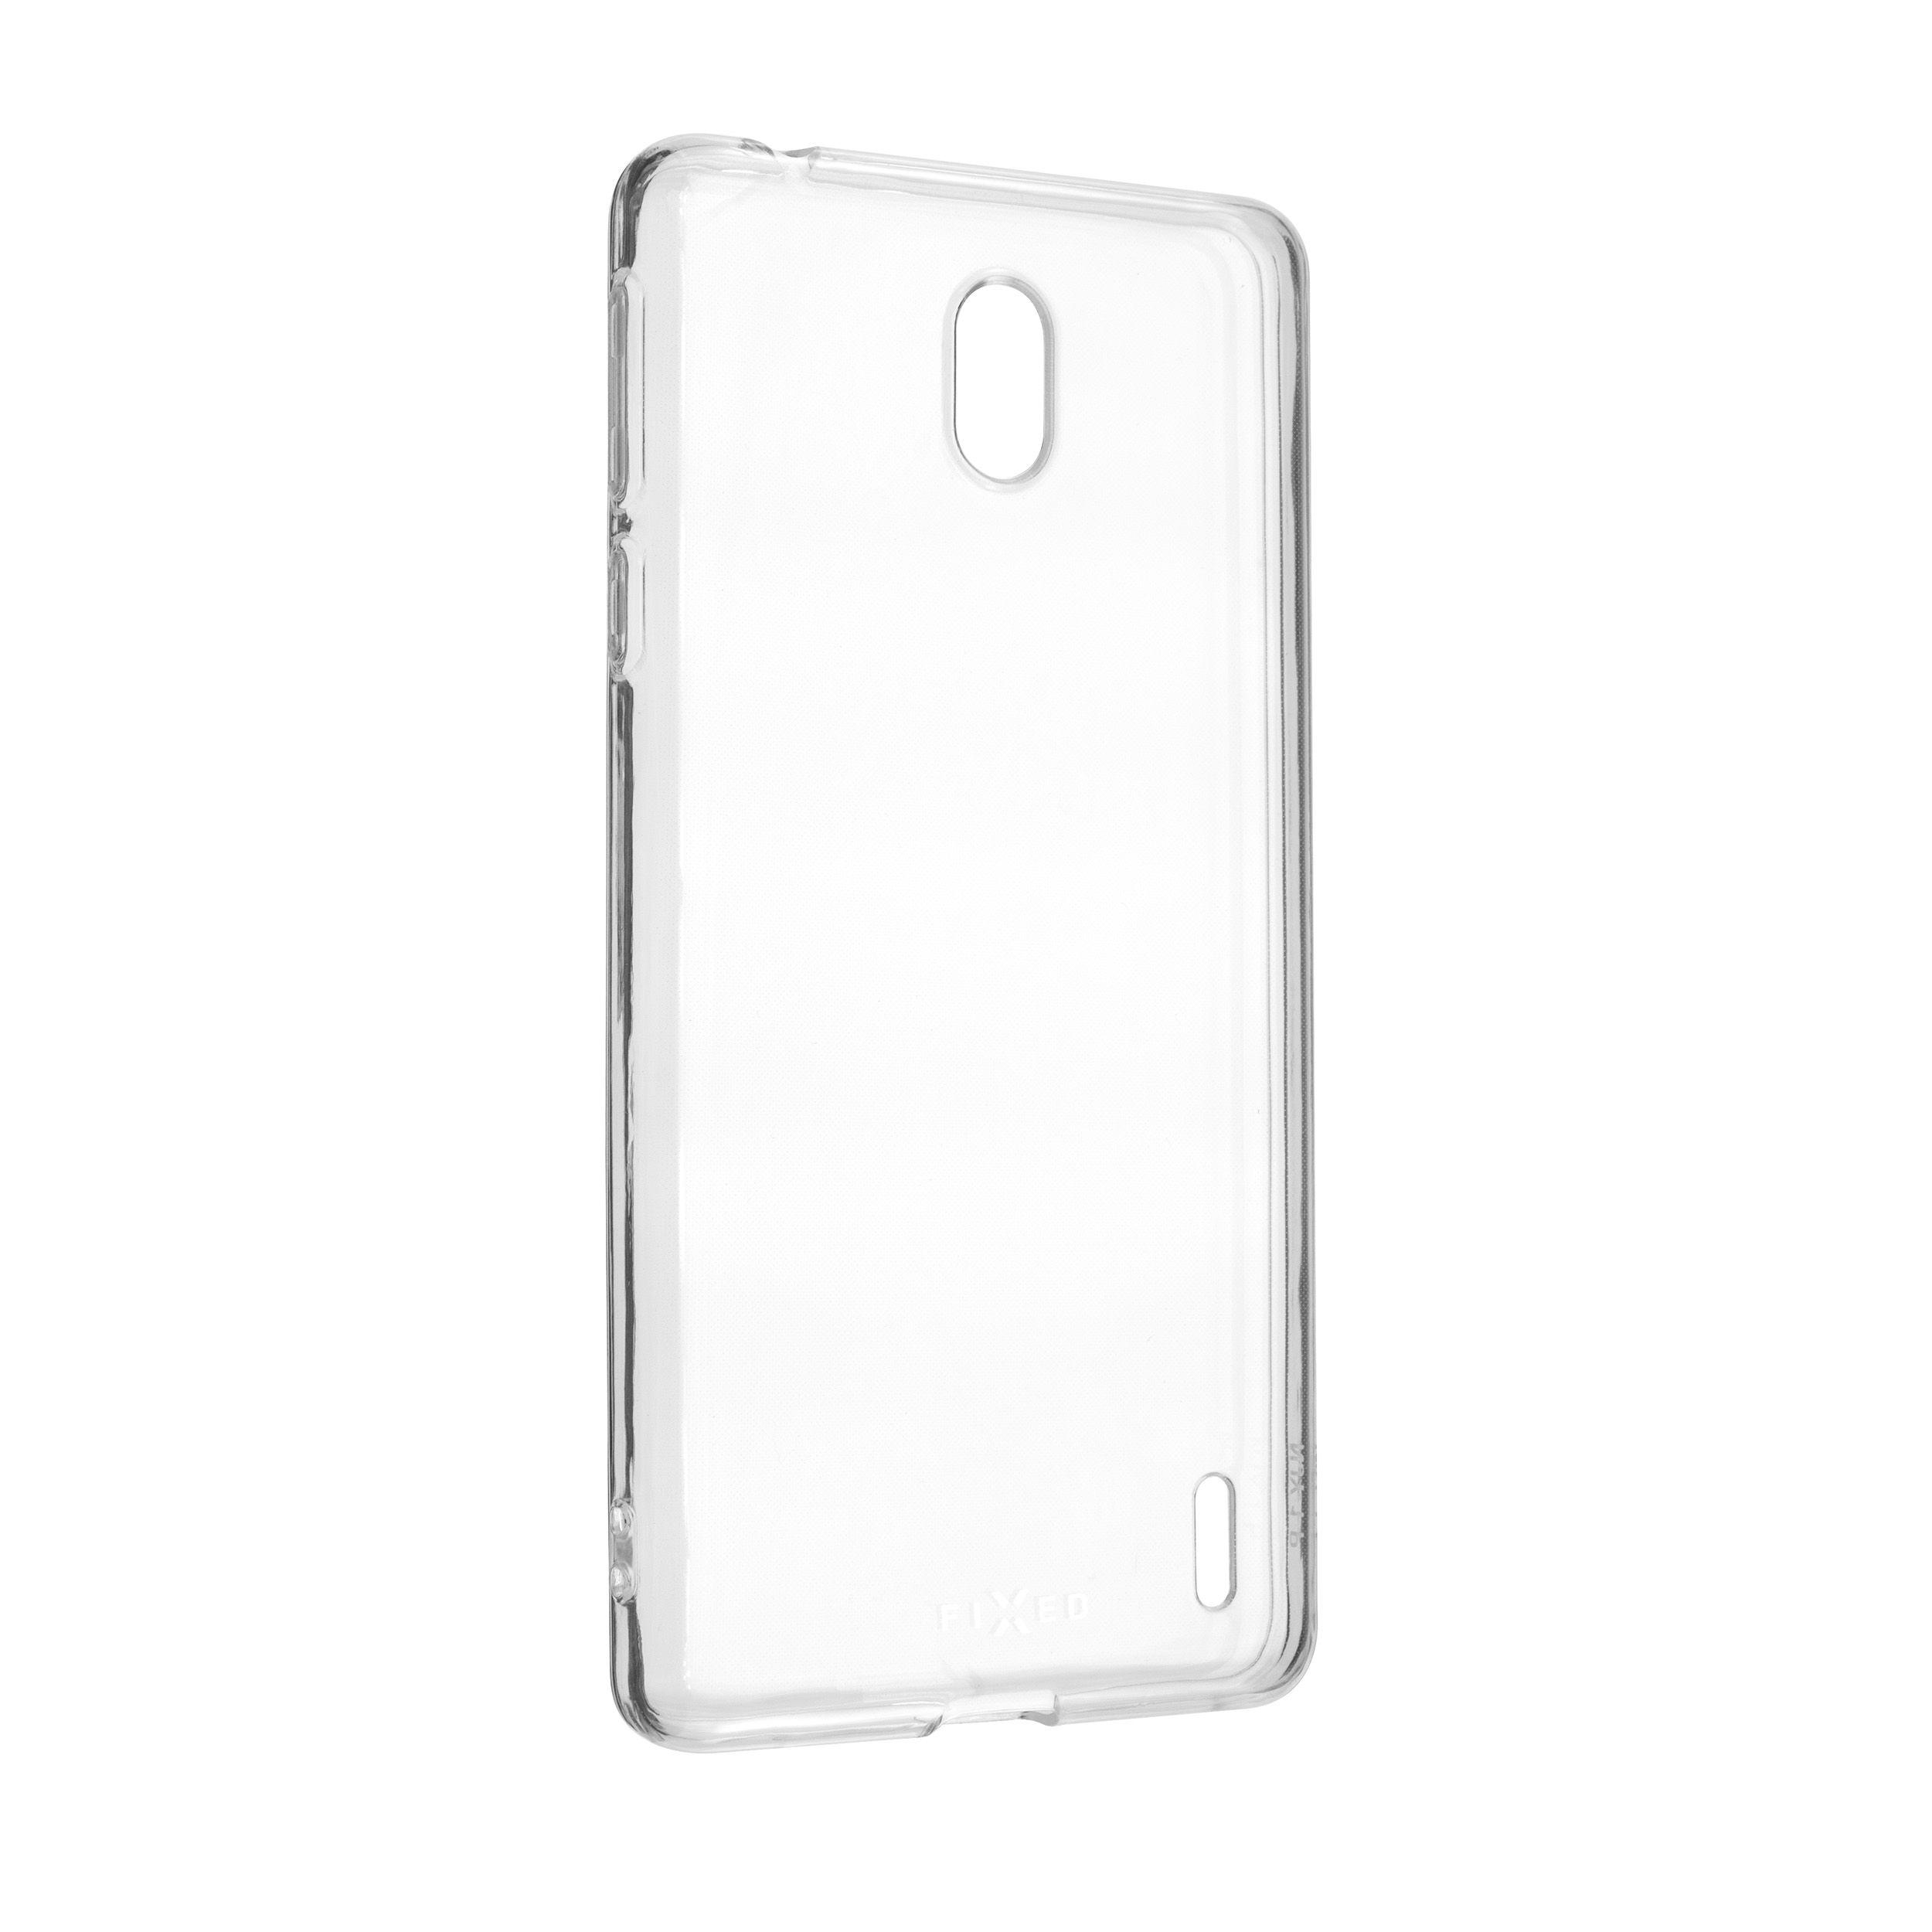 Ultratenké TPU gelové pouzdro FIXED Skin pro Nokia 1 Plus, 0,6 mm, čiré